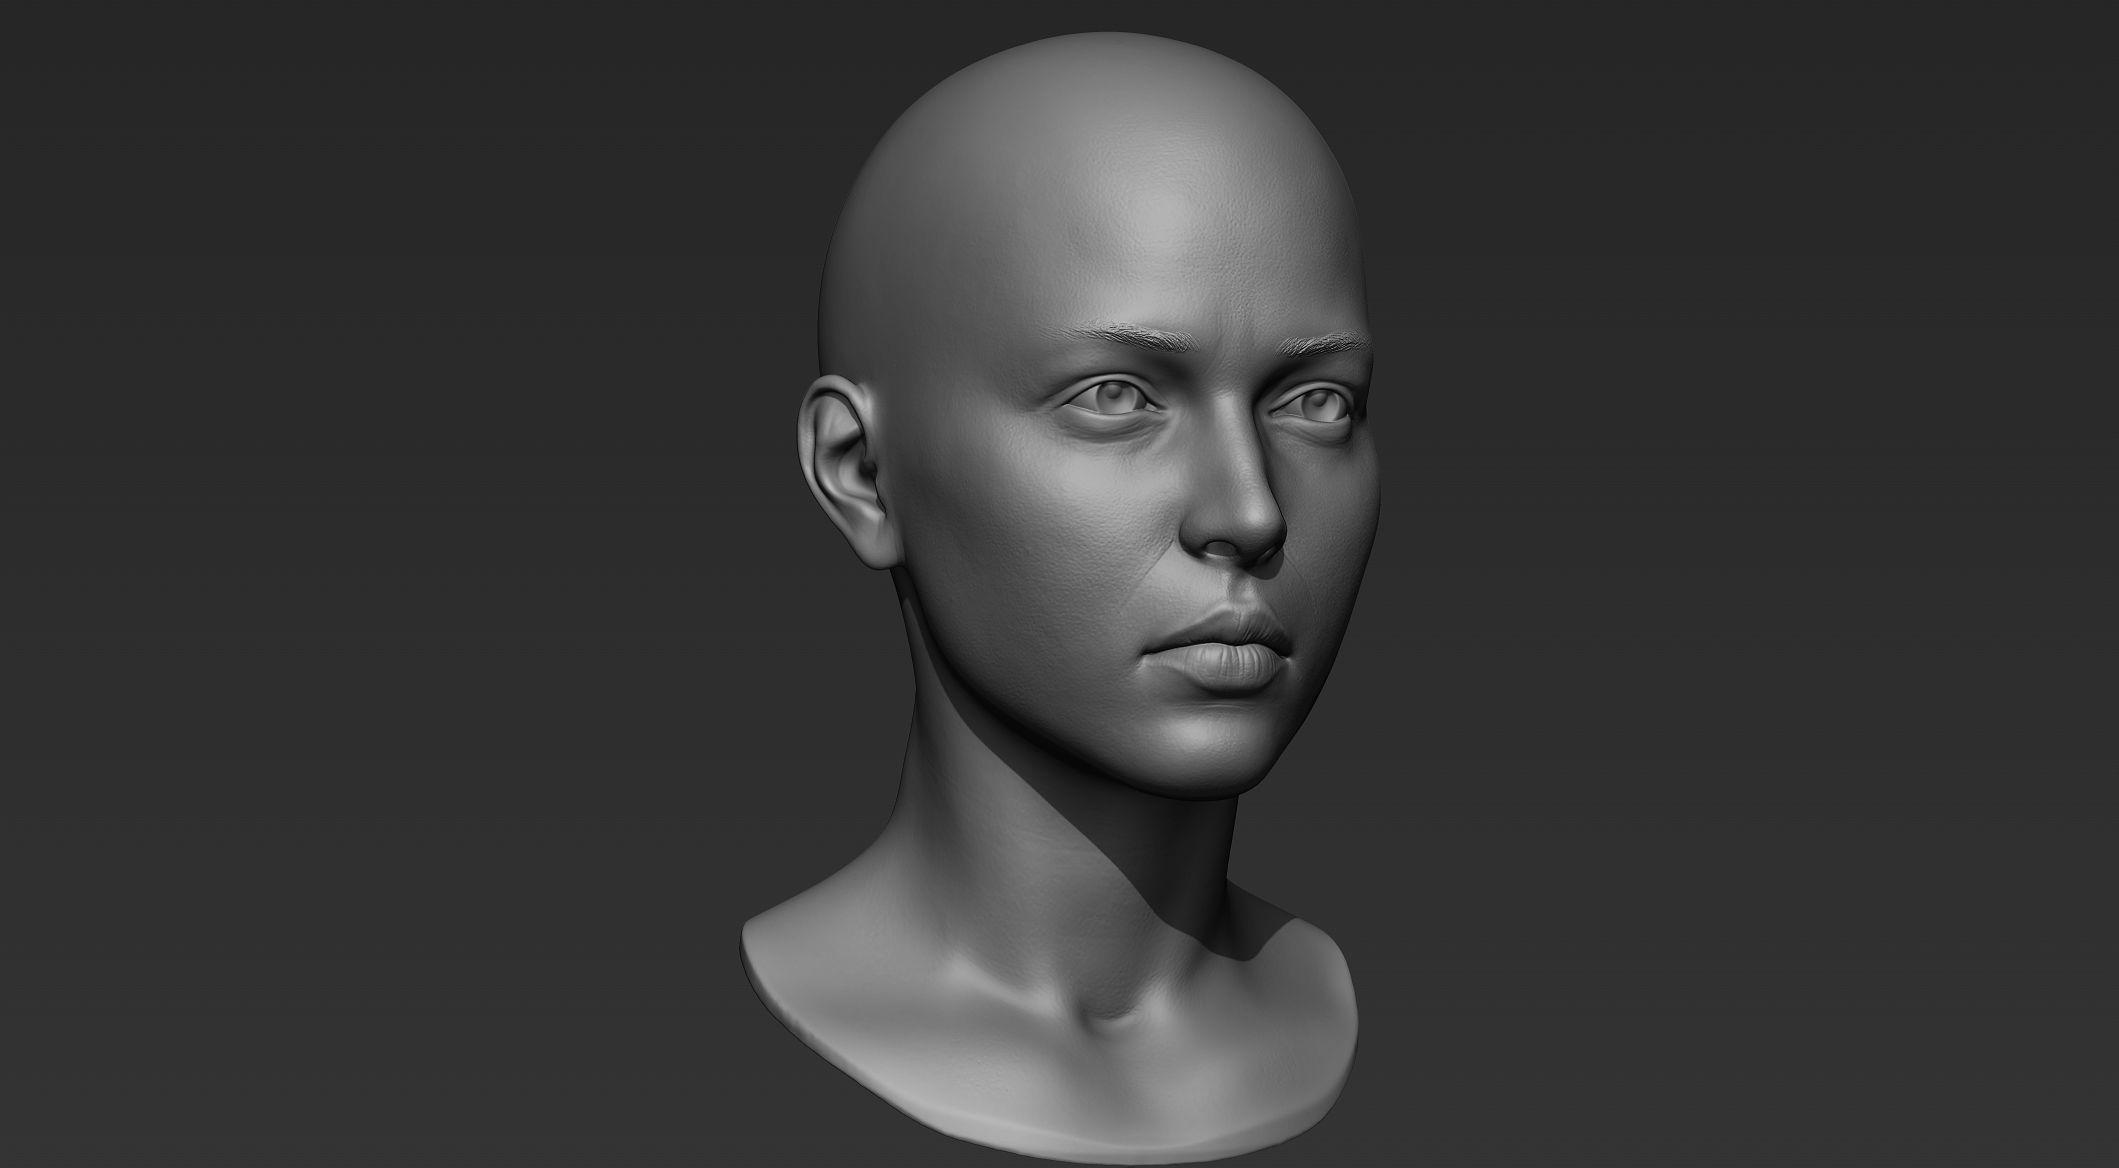 3D Printable Female Head 9